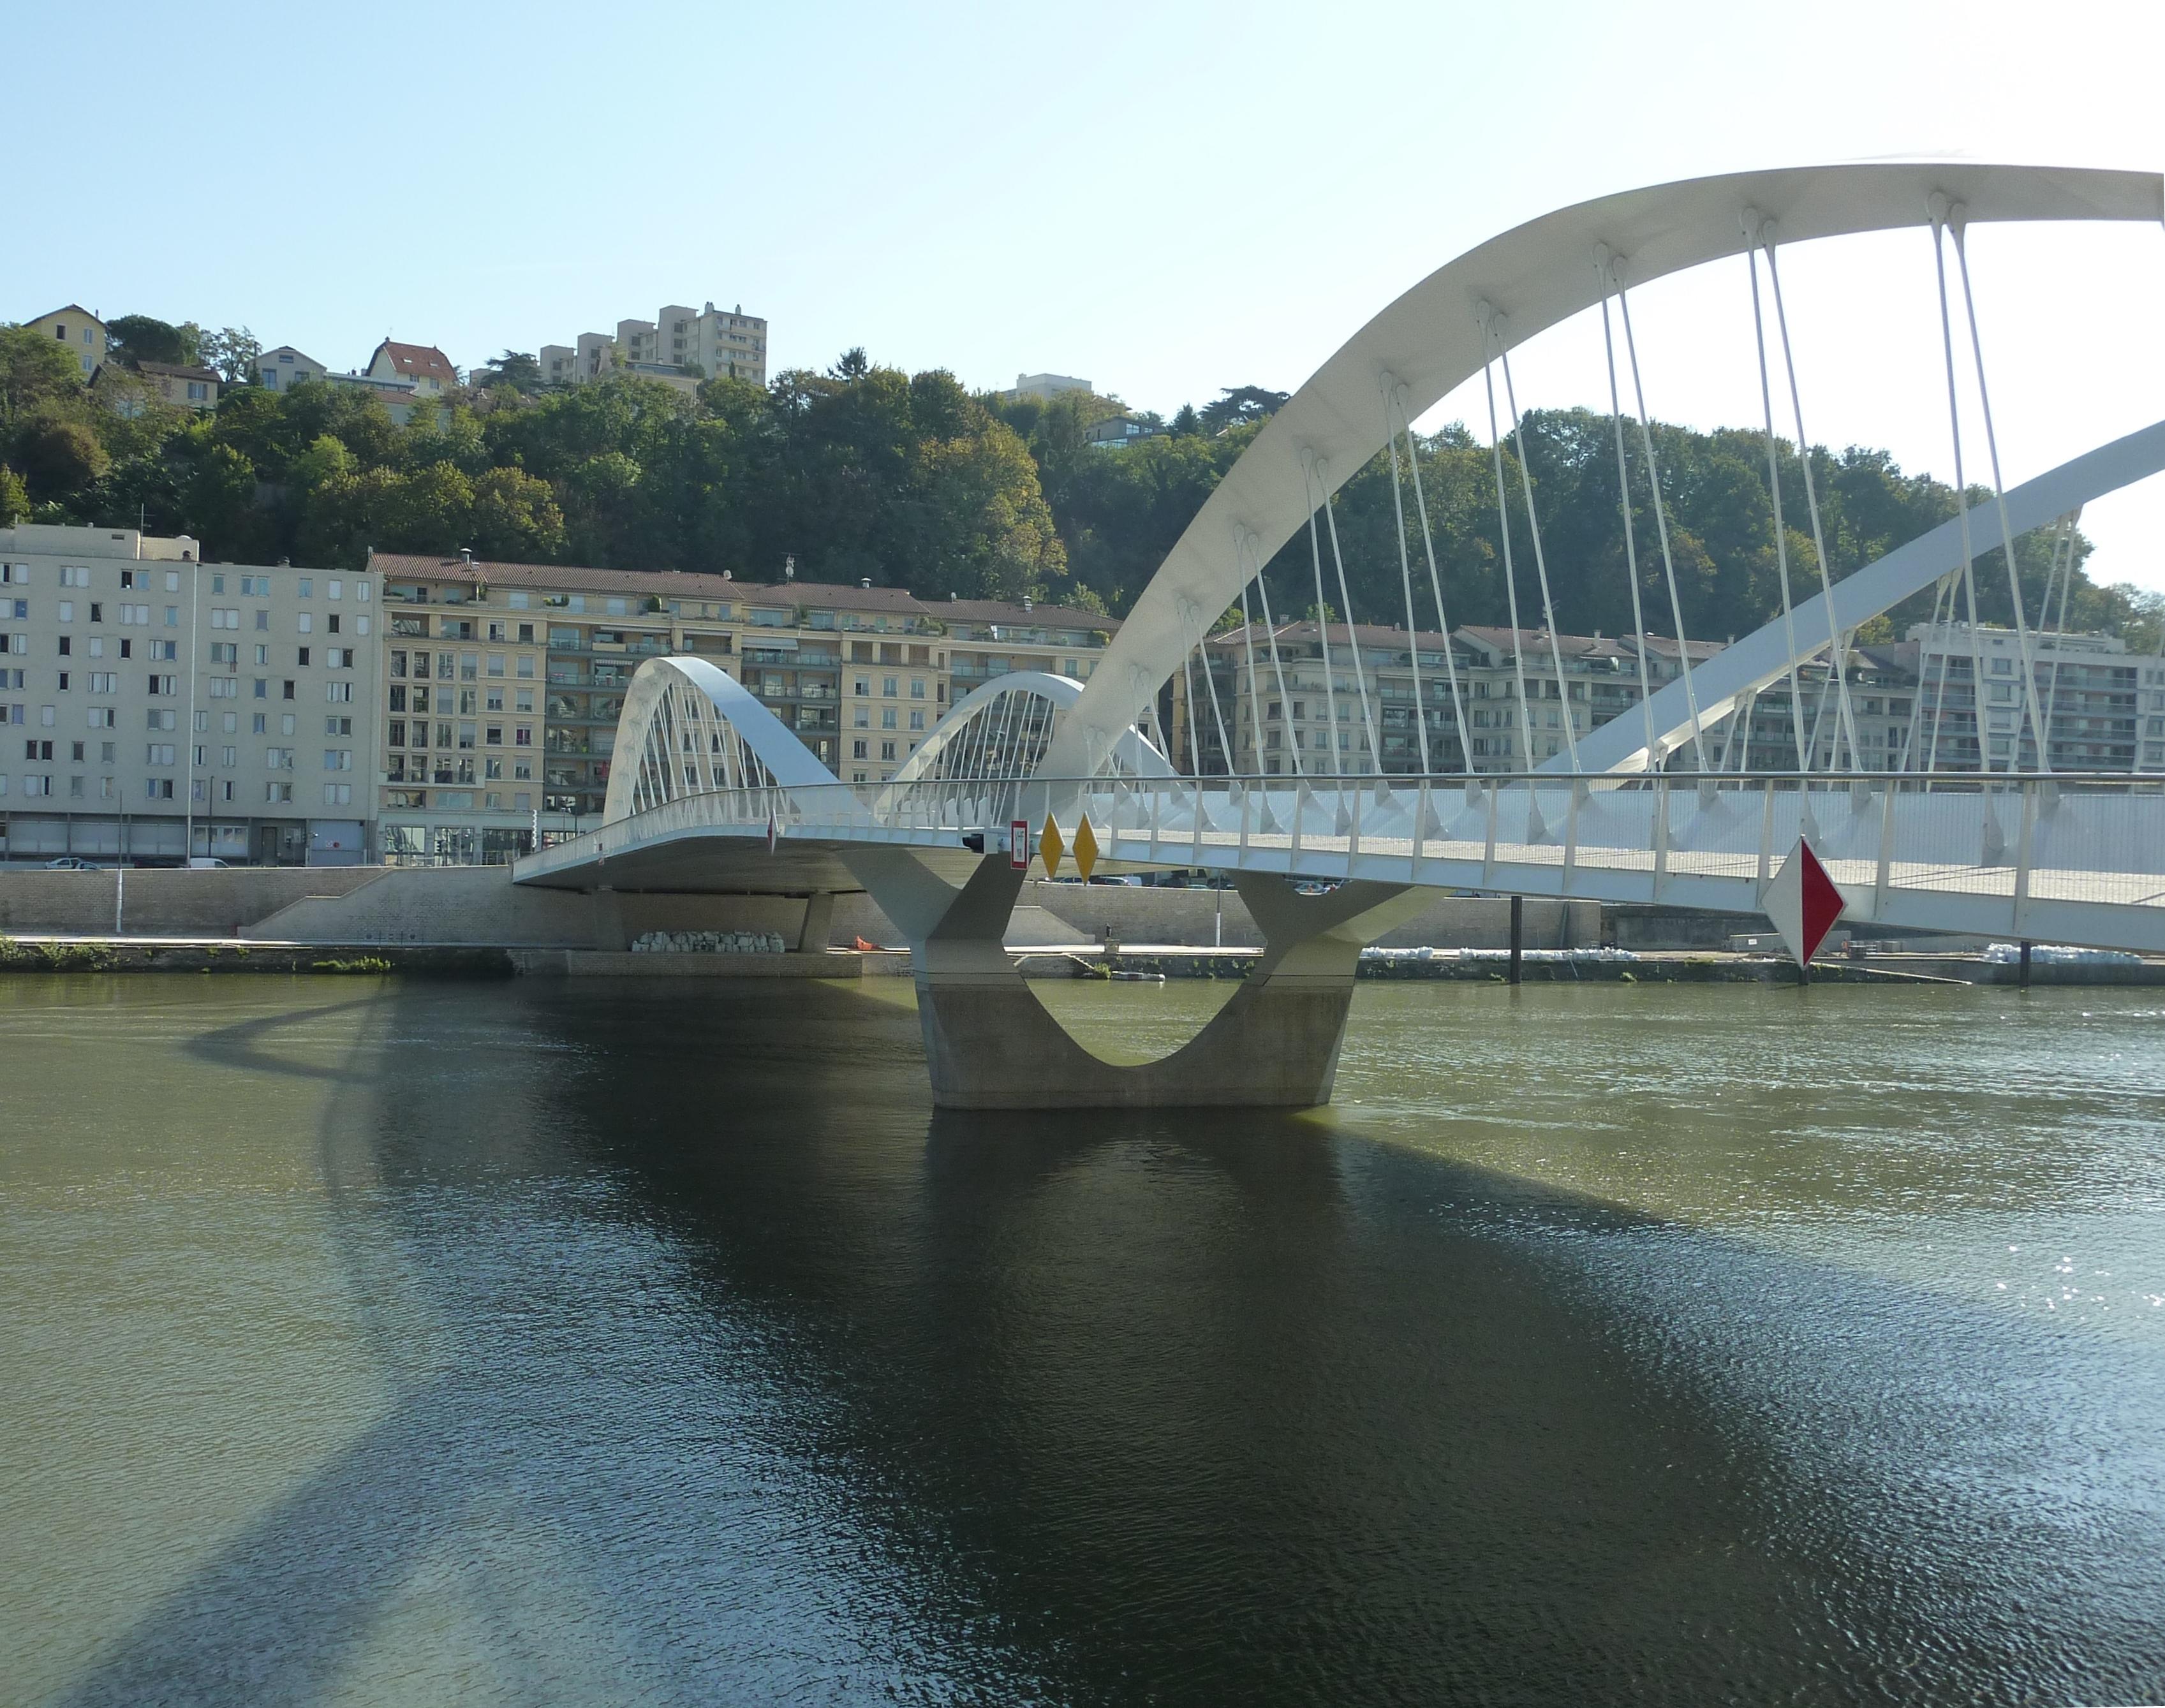 Photographes En Rhone Alpes Le Pont Robert Schuman